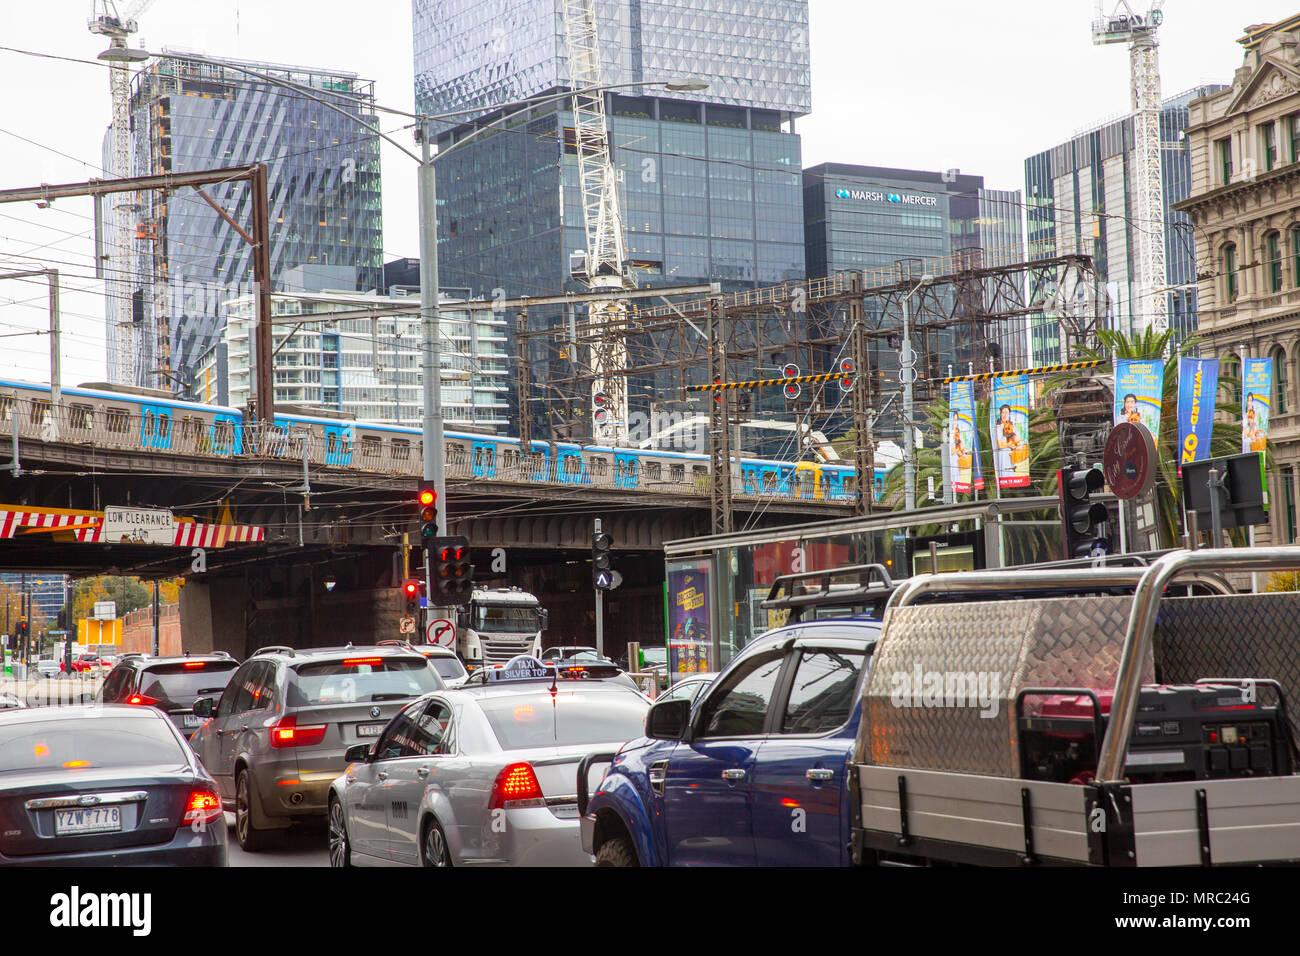 Traffic vehicle congestion in Melbourne city centre,Victoria,Australia - Stock Image